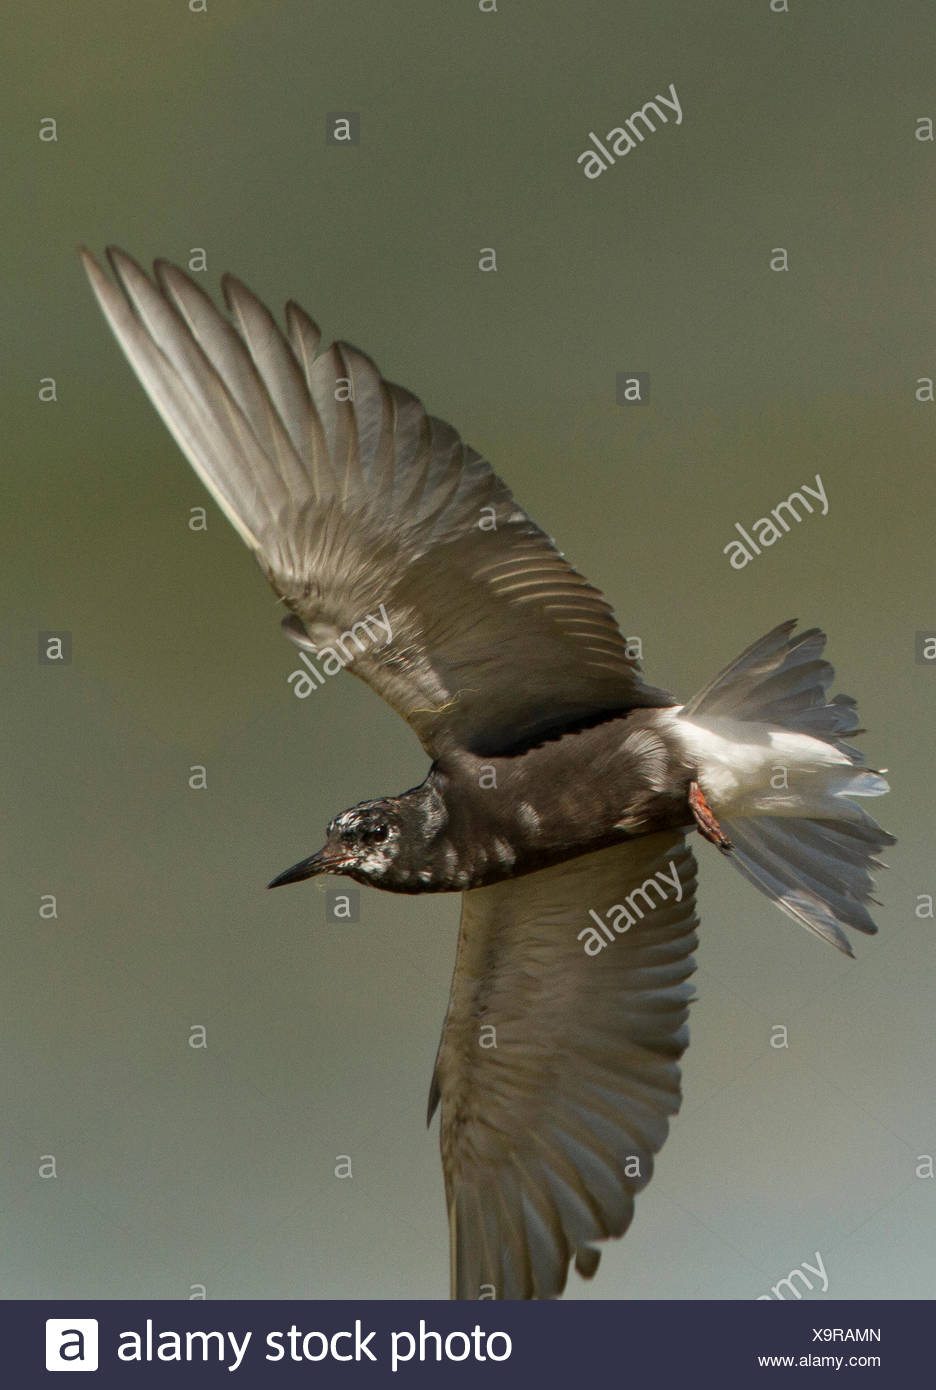 Black Tern, Chlidonias niger, Alberta, Canada - Stock Image